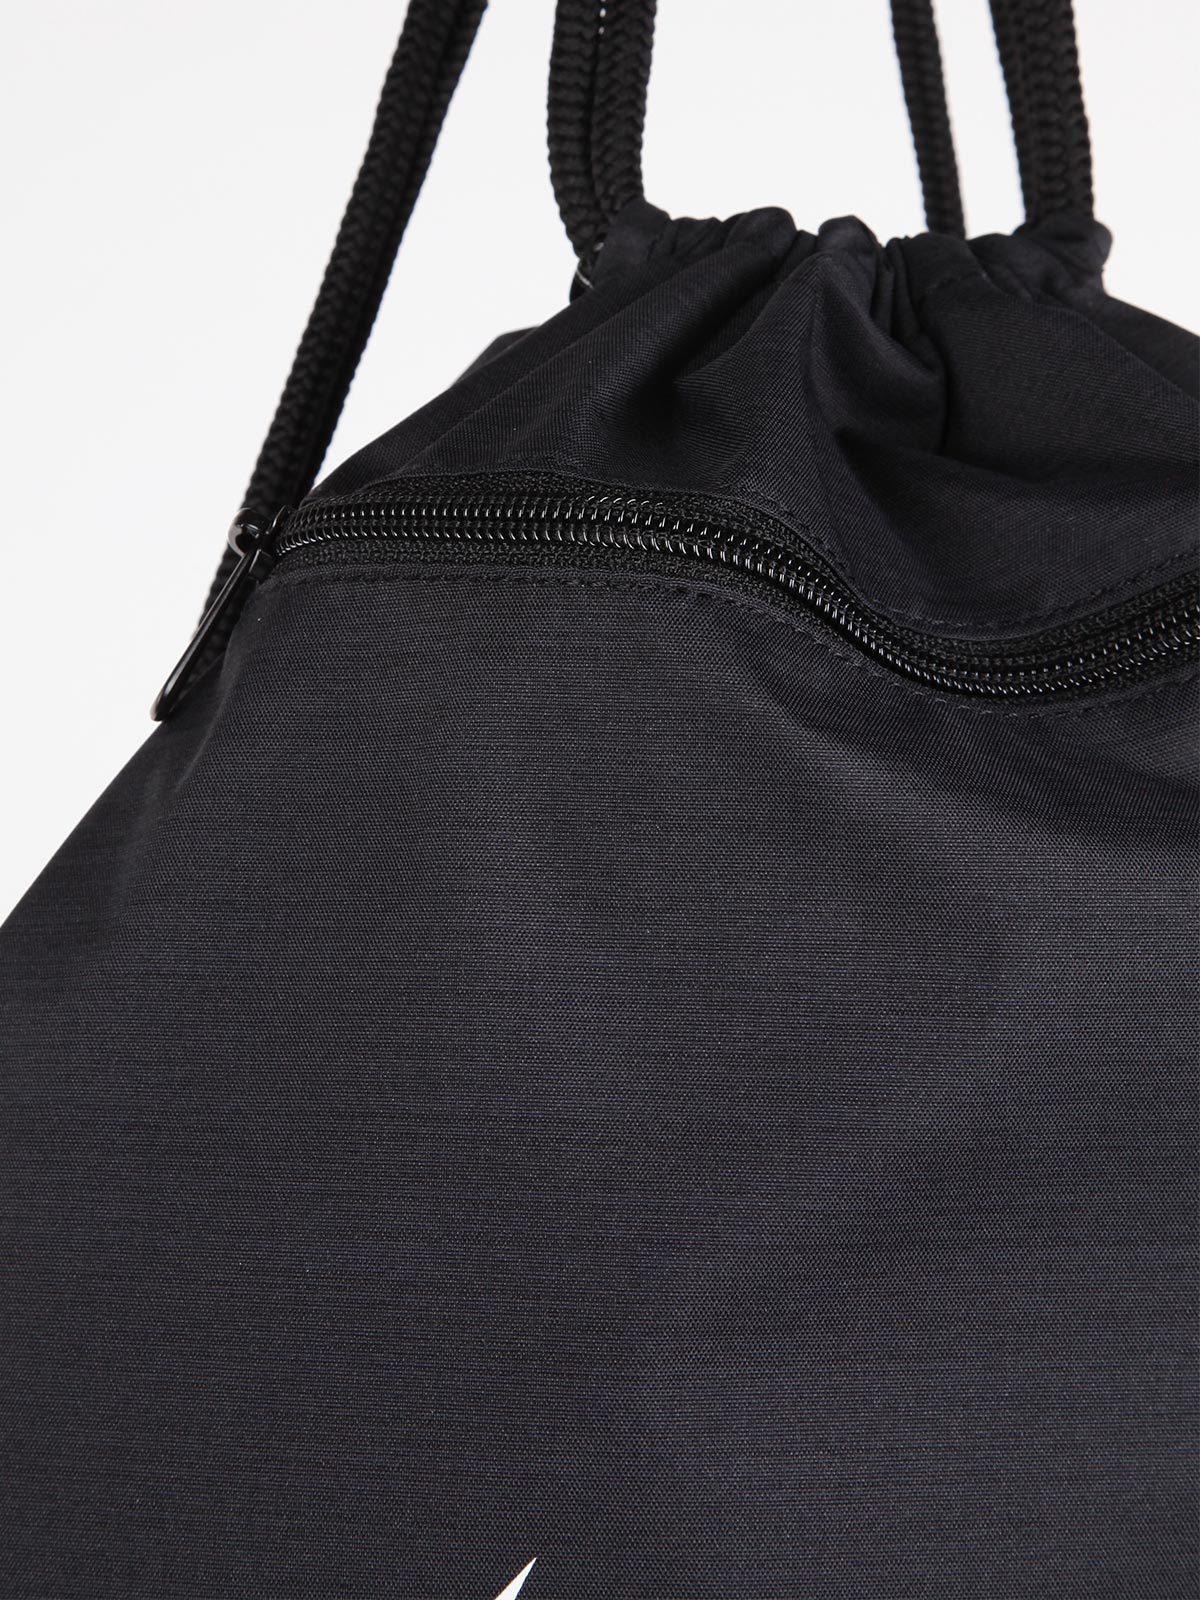 c2f94e186f Brasilia gym sack- sacca a corde nera nike | MecShopping